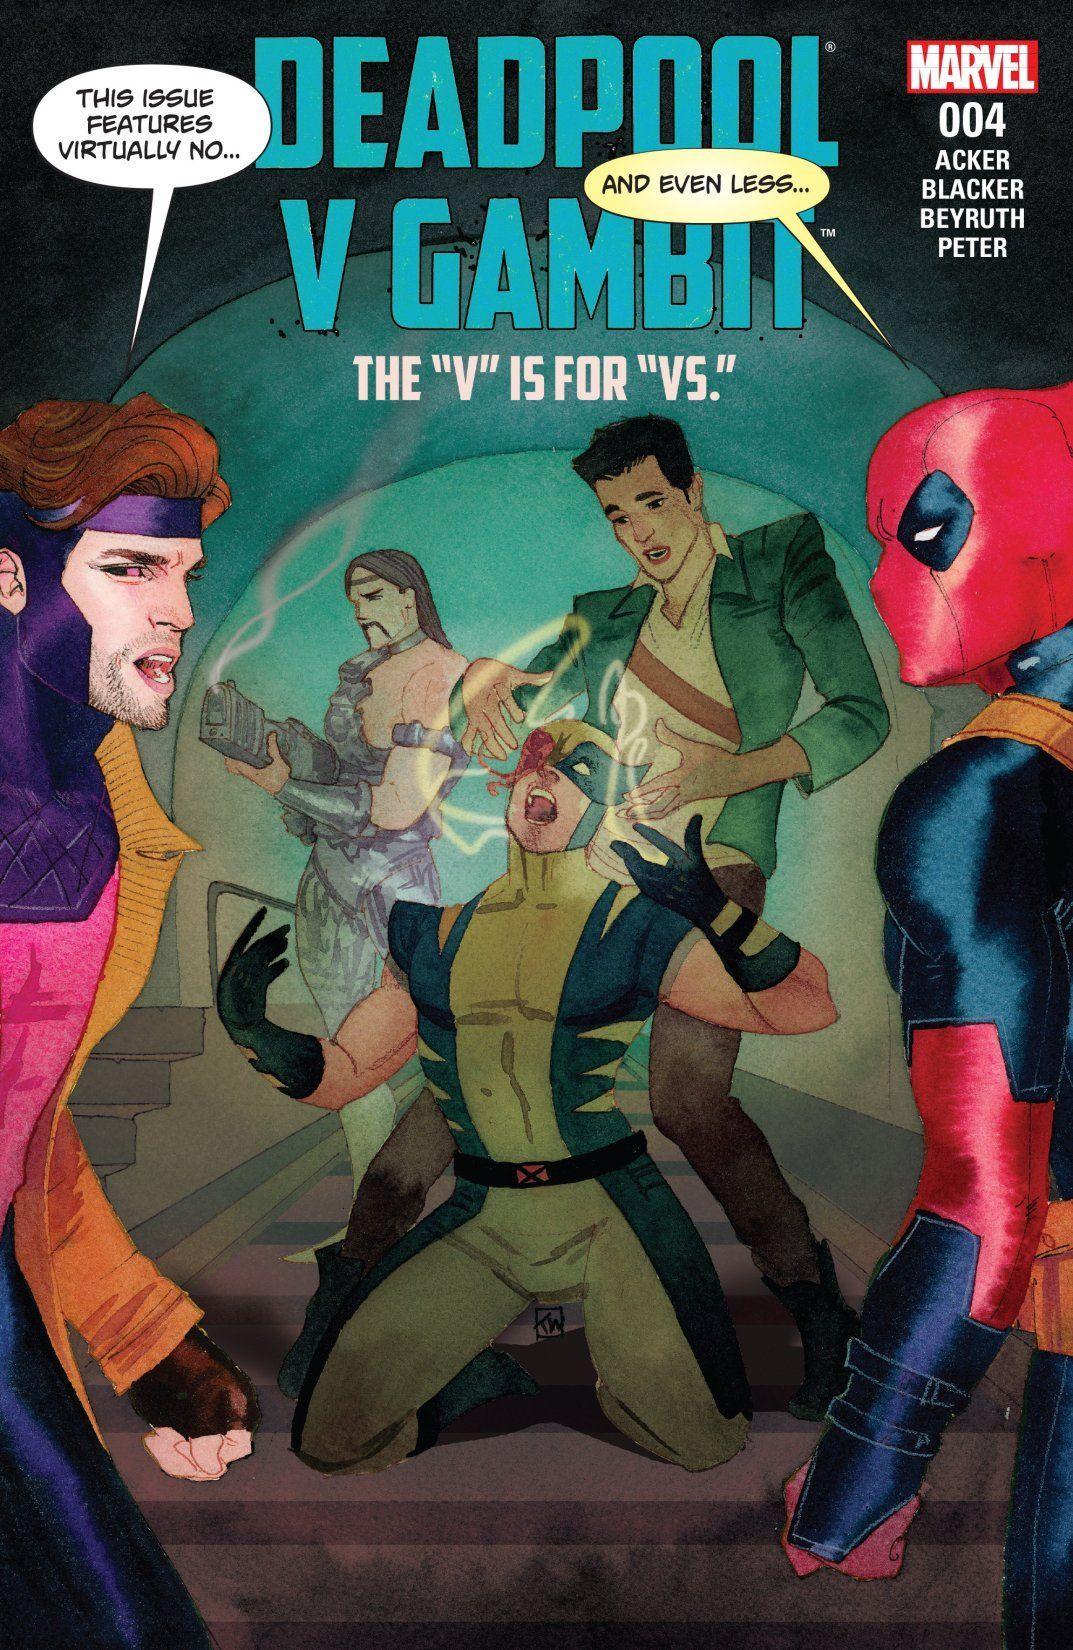 Deadpool v Gambit (2016) 4 (of 5) Comics by comiXology